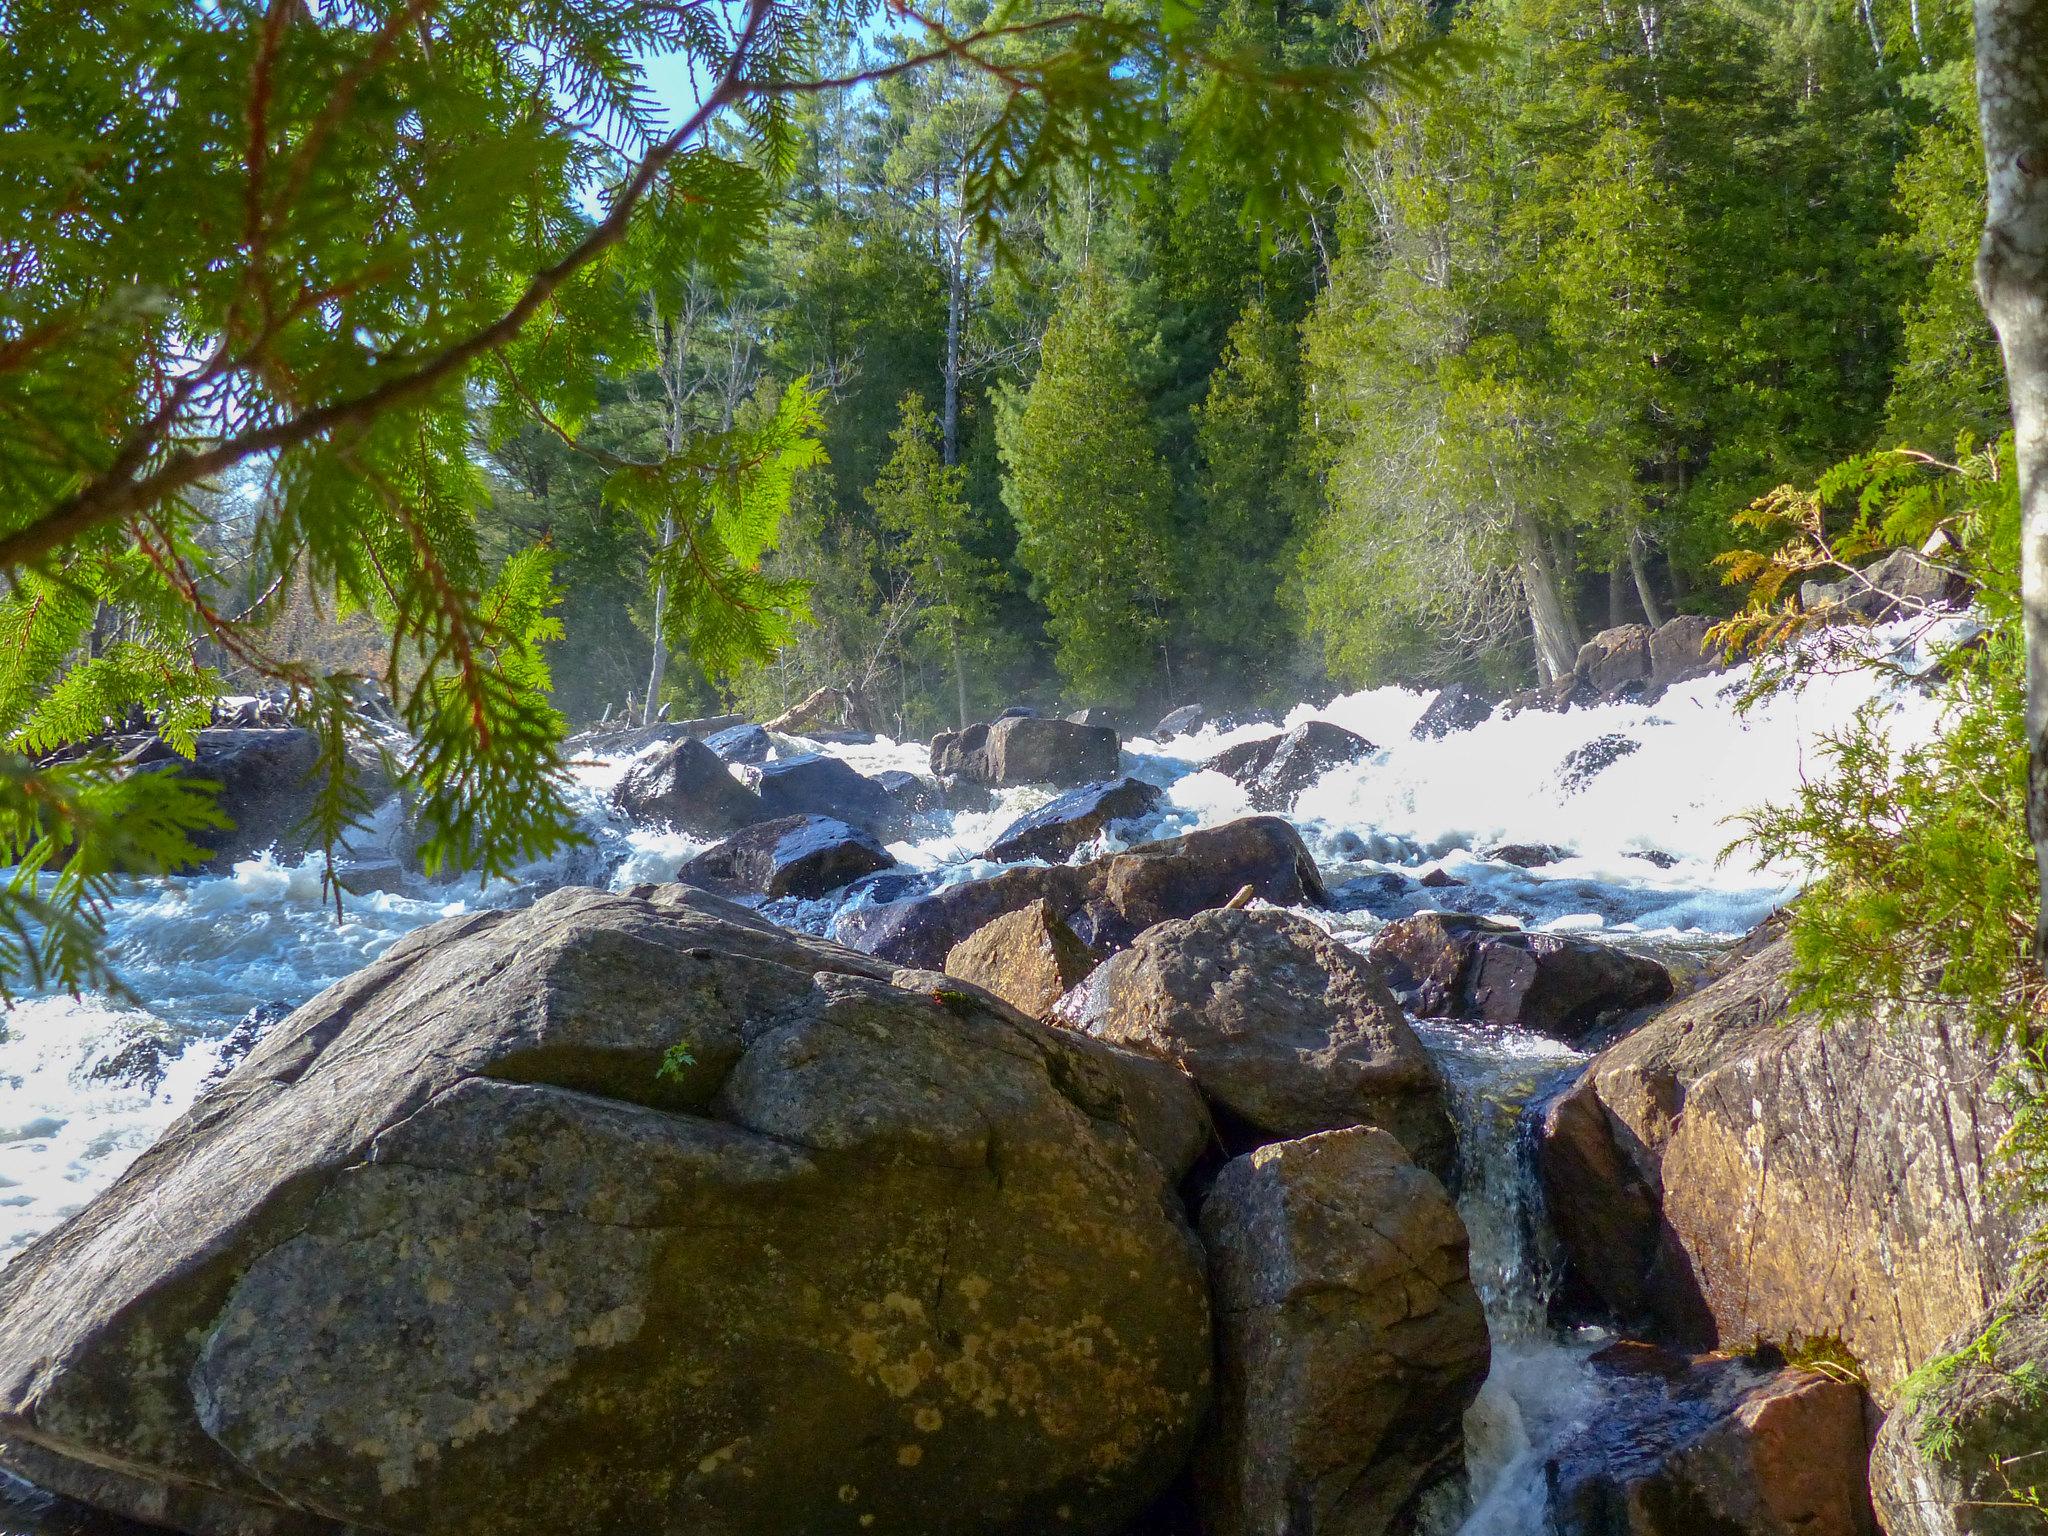 Oxtongue River - Ragged Falls Provincial Park (4)